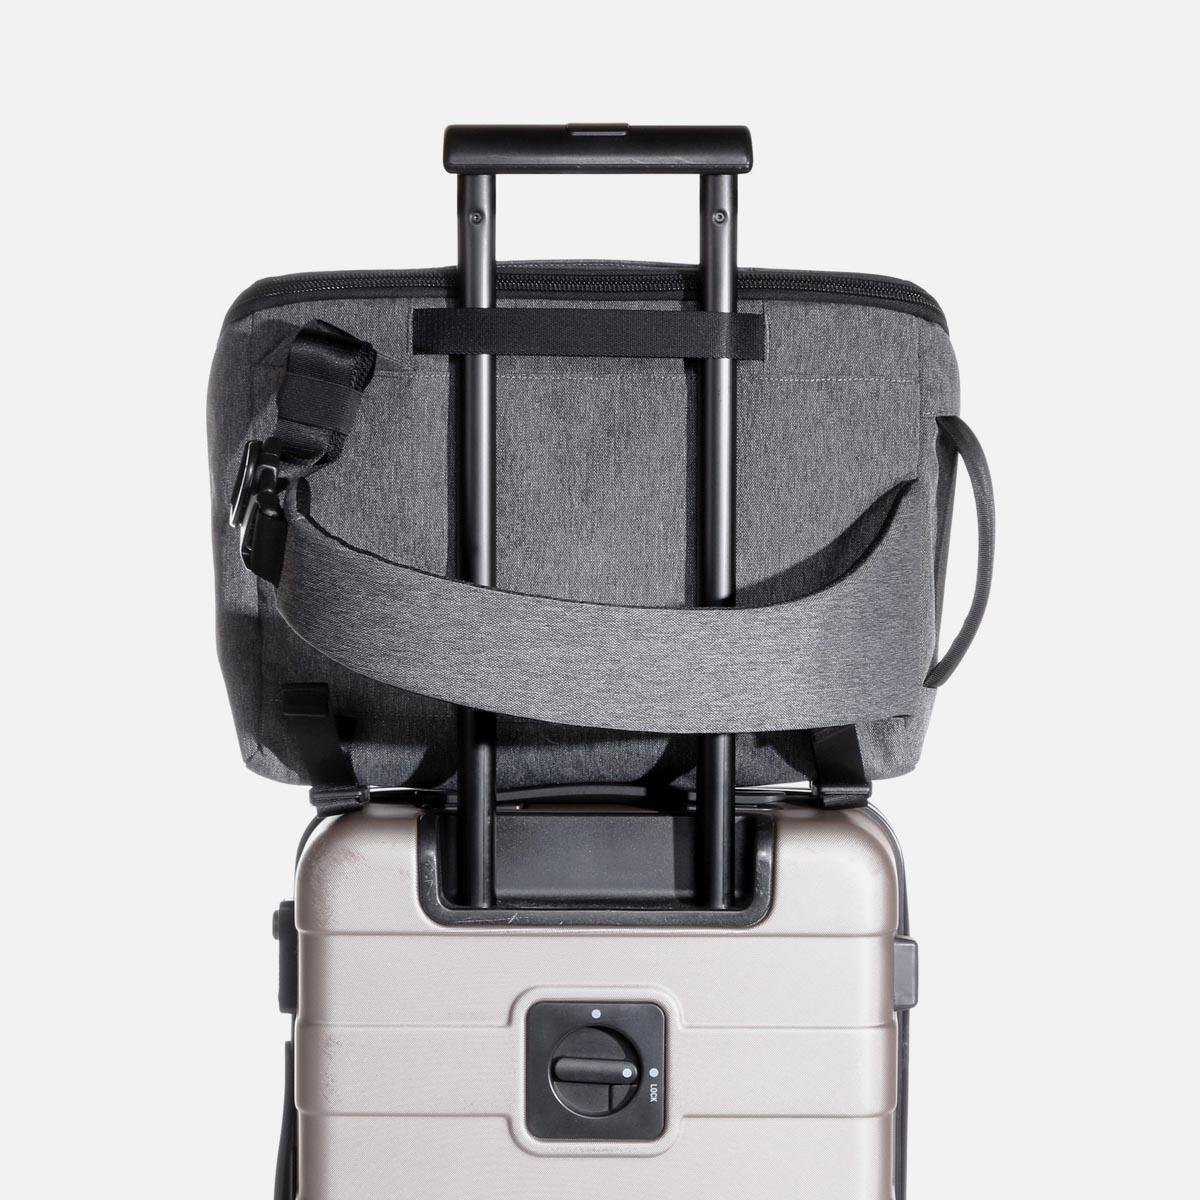 22005_ts_gray_luggage.JPG